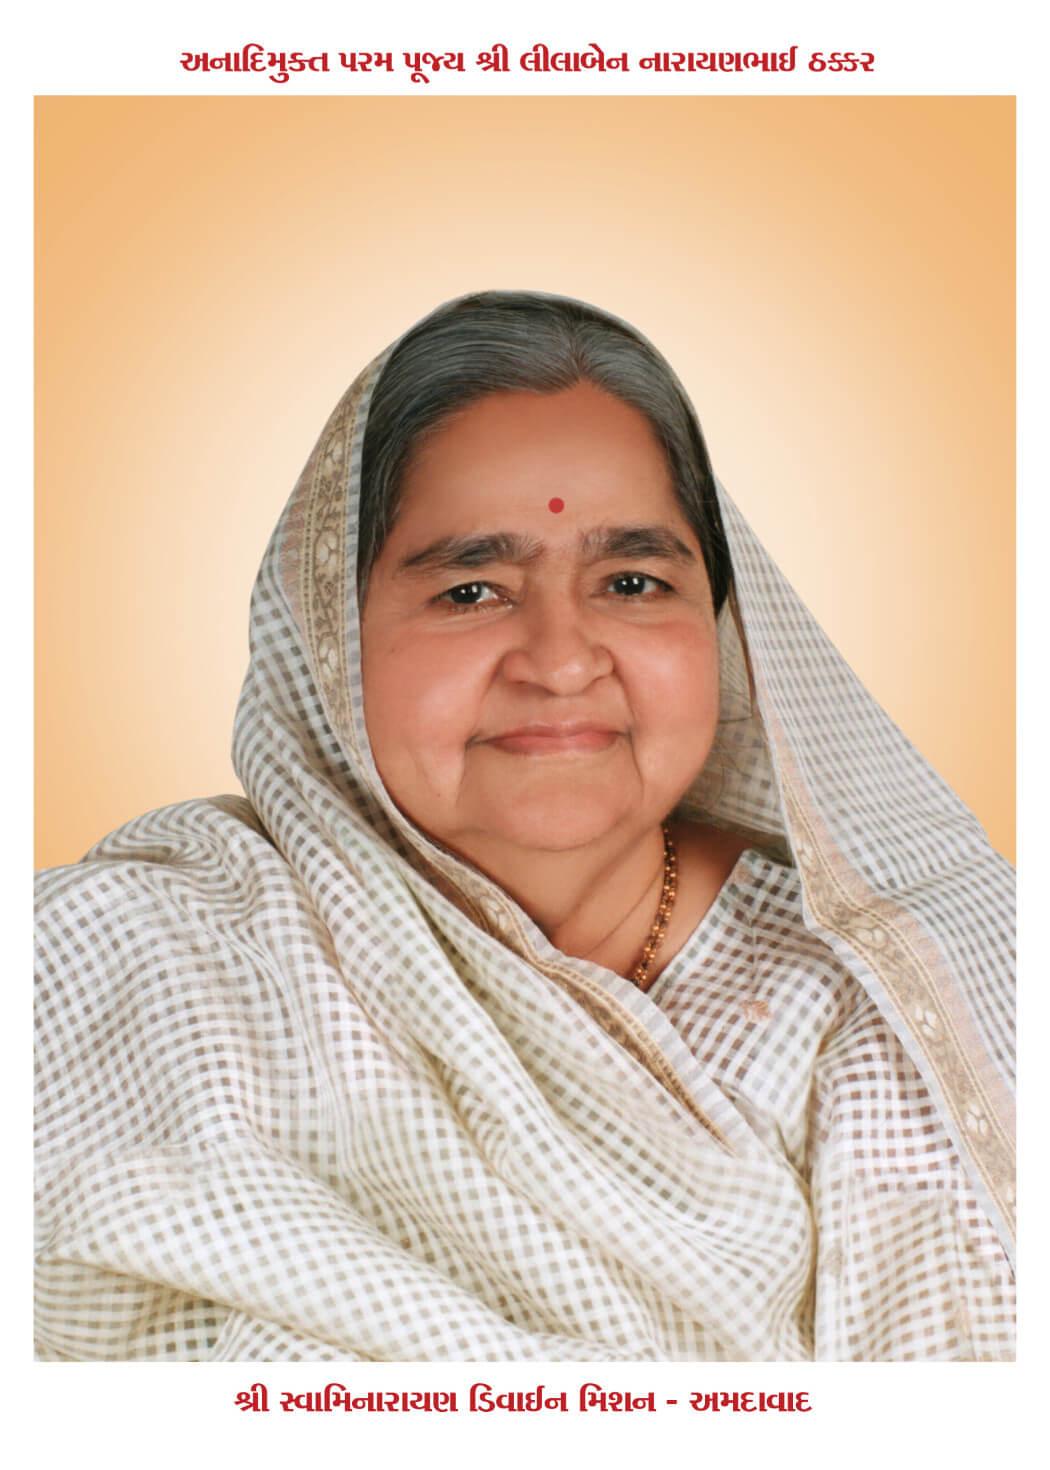 Pujya Leelamasi Pragtyadin Satsang Brahmyagna Dt 05/02/2020